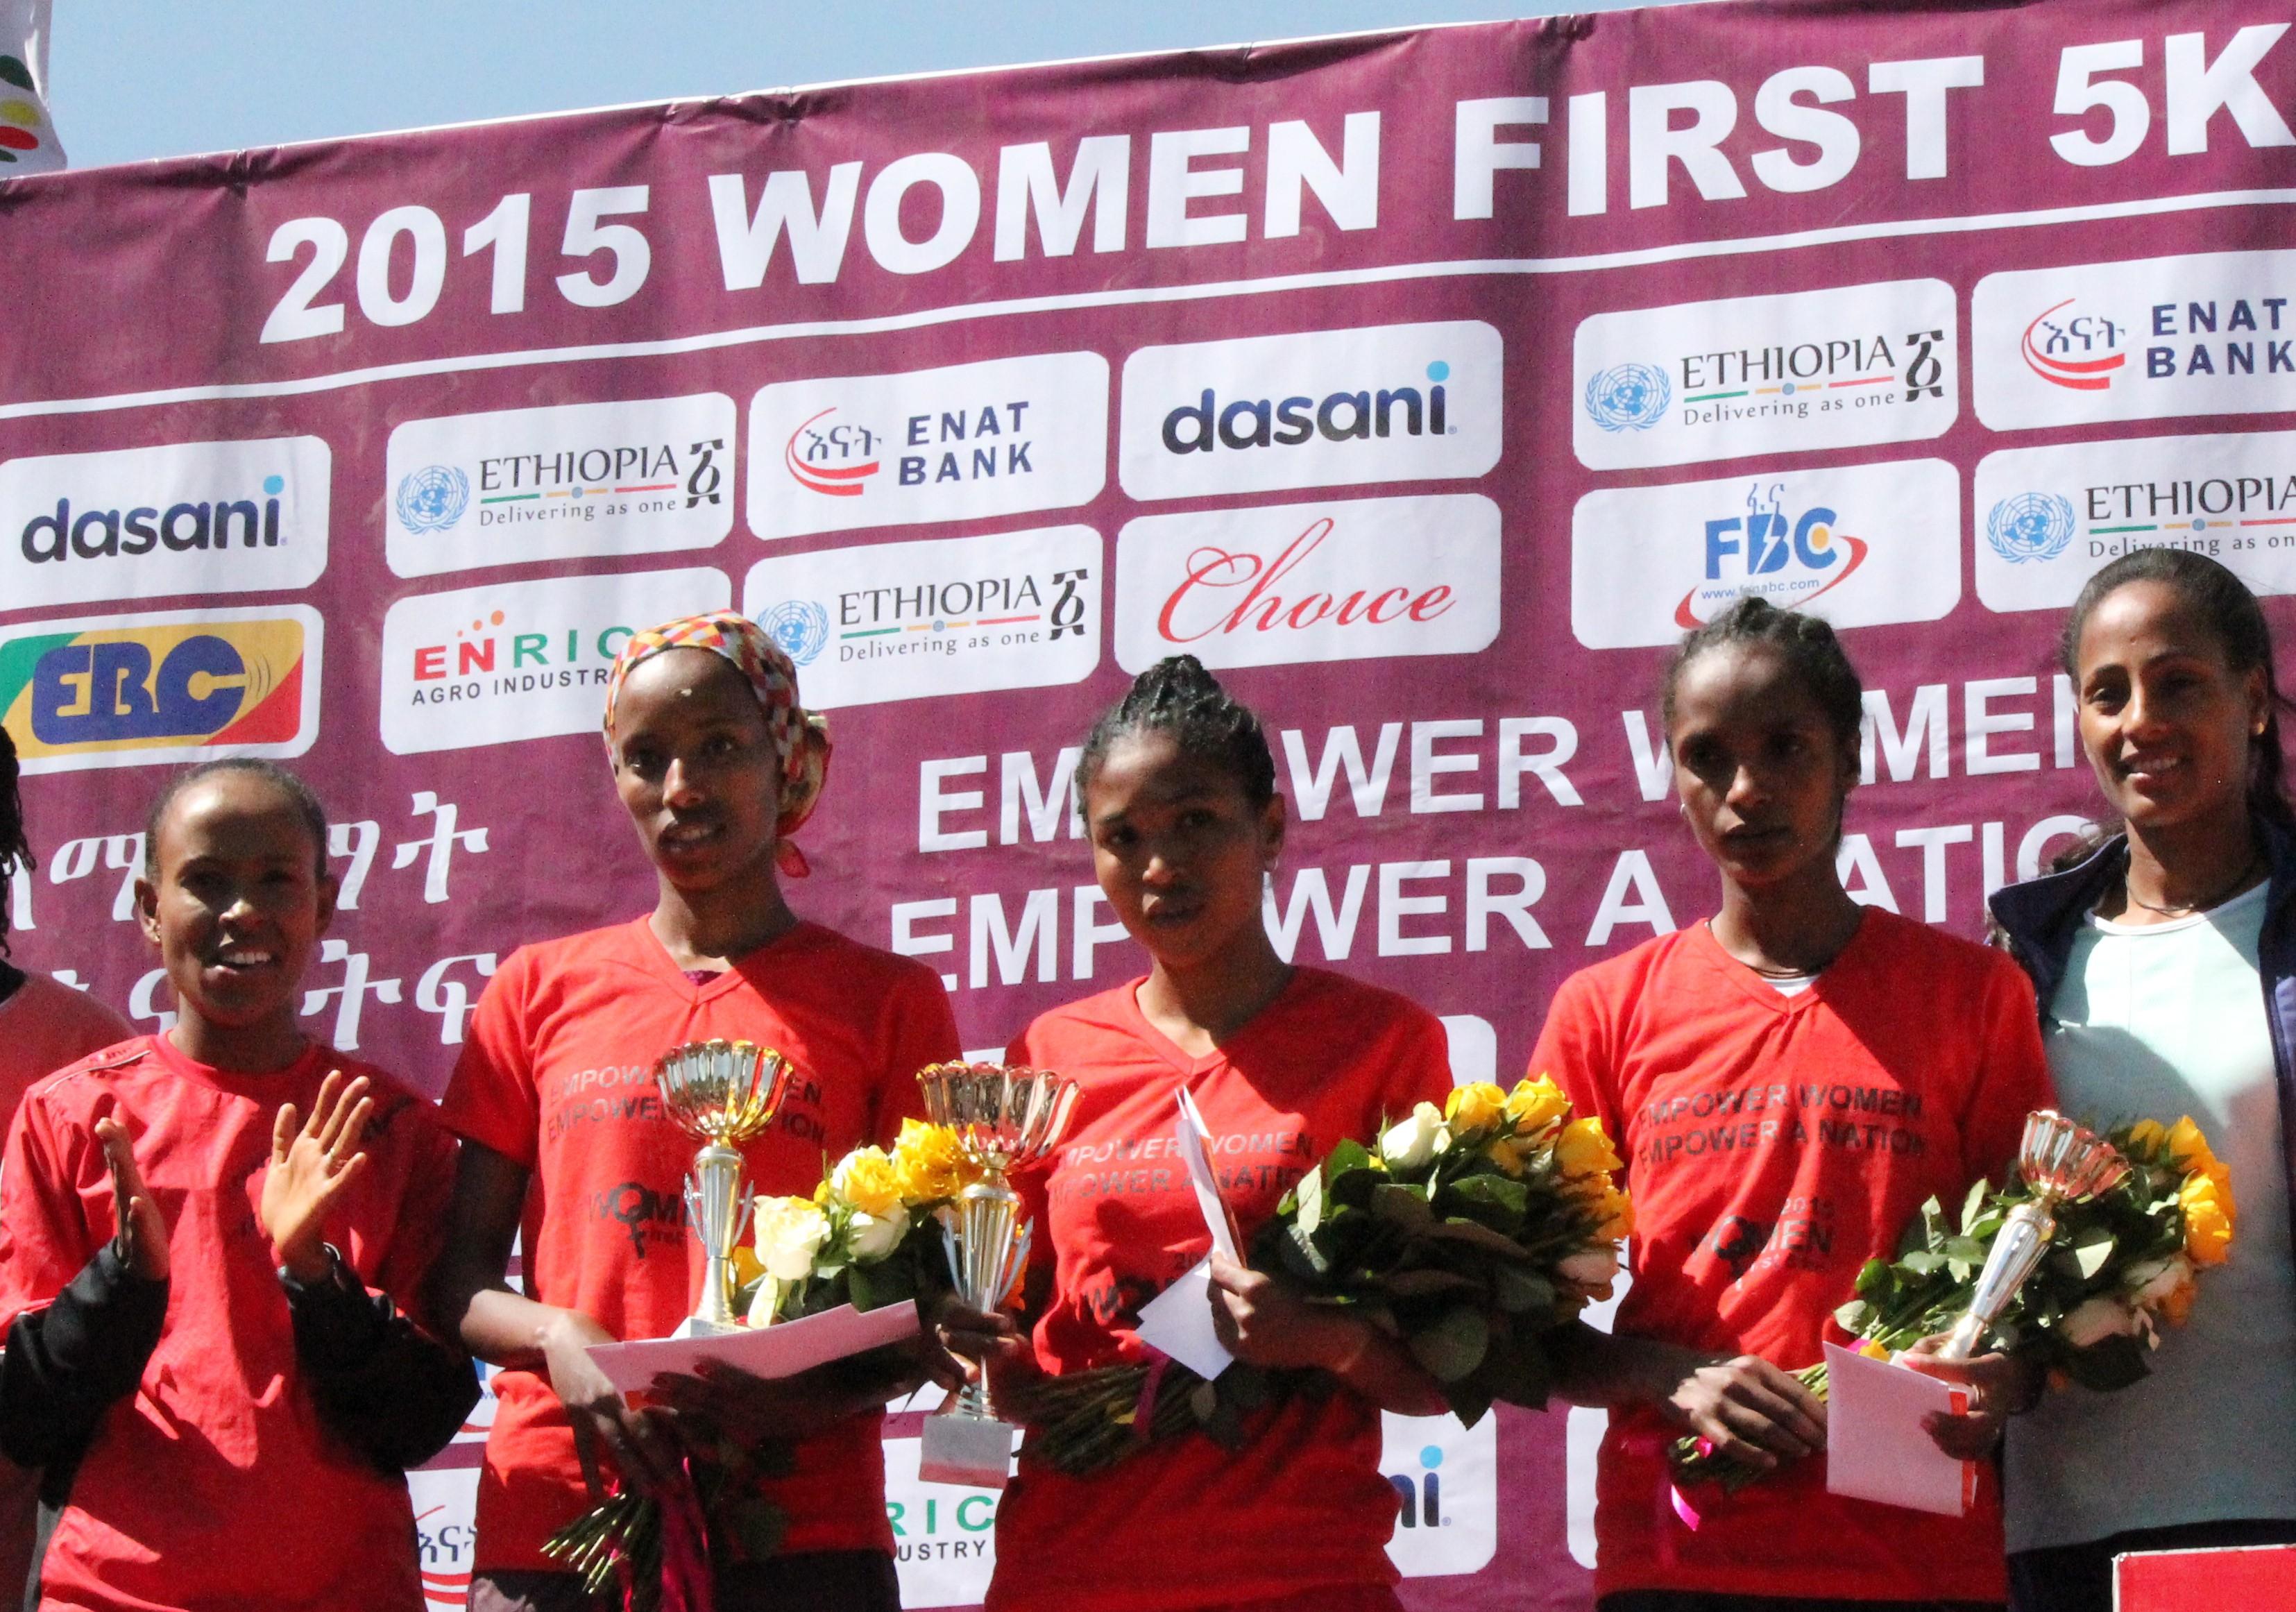 2015 women first 5k winners with meseret and Aselefech- Photo by Bizuayehu Wagaw